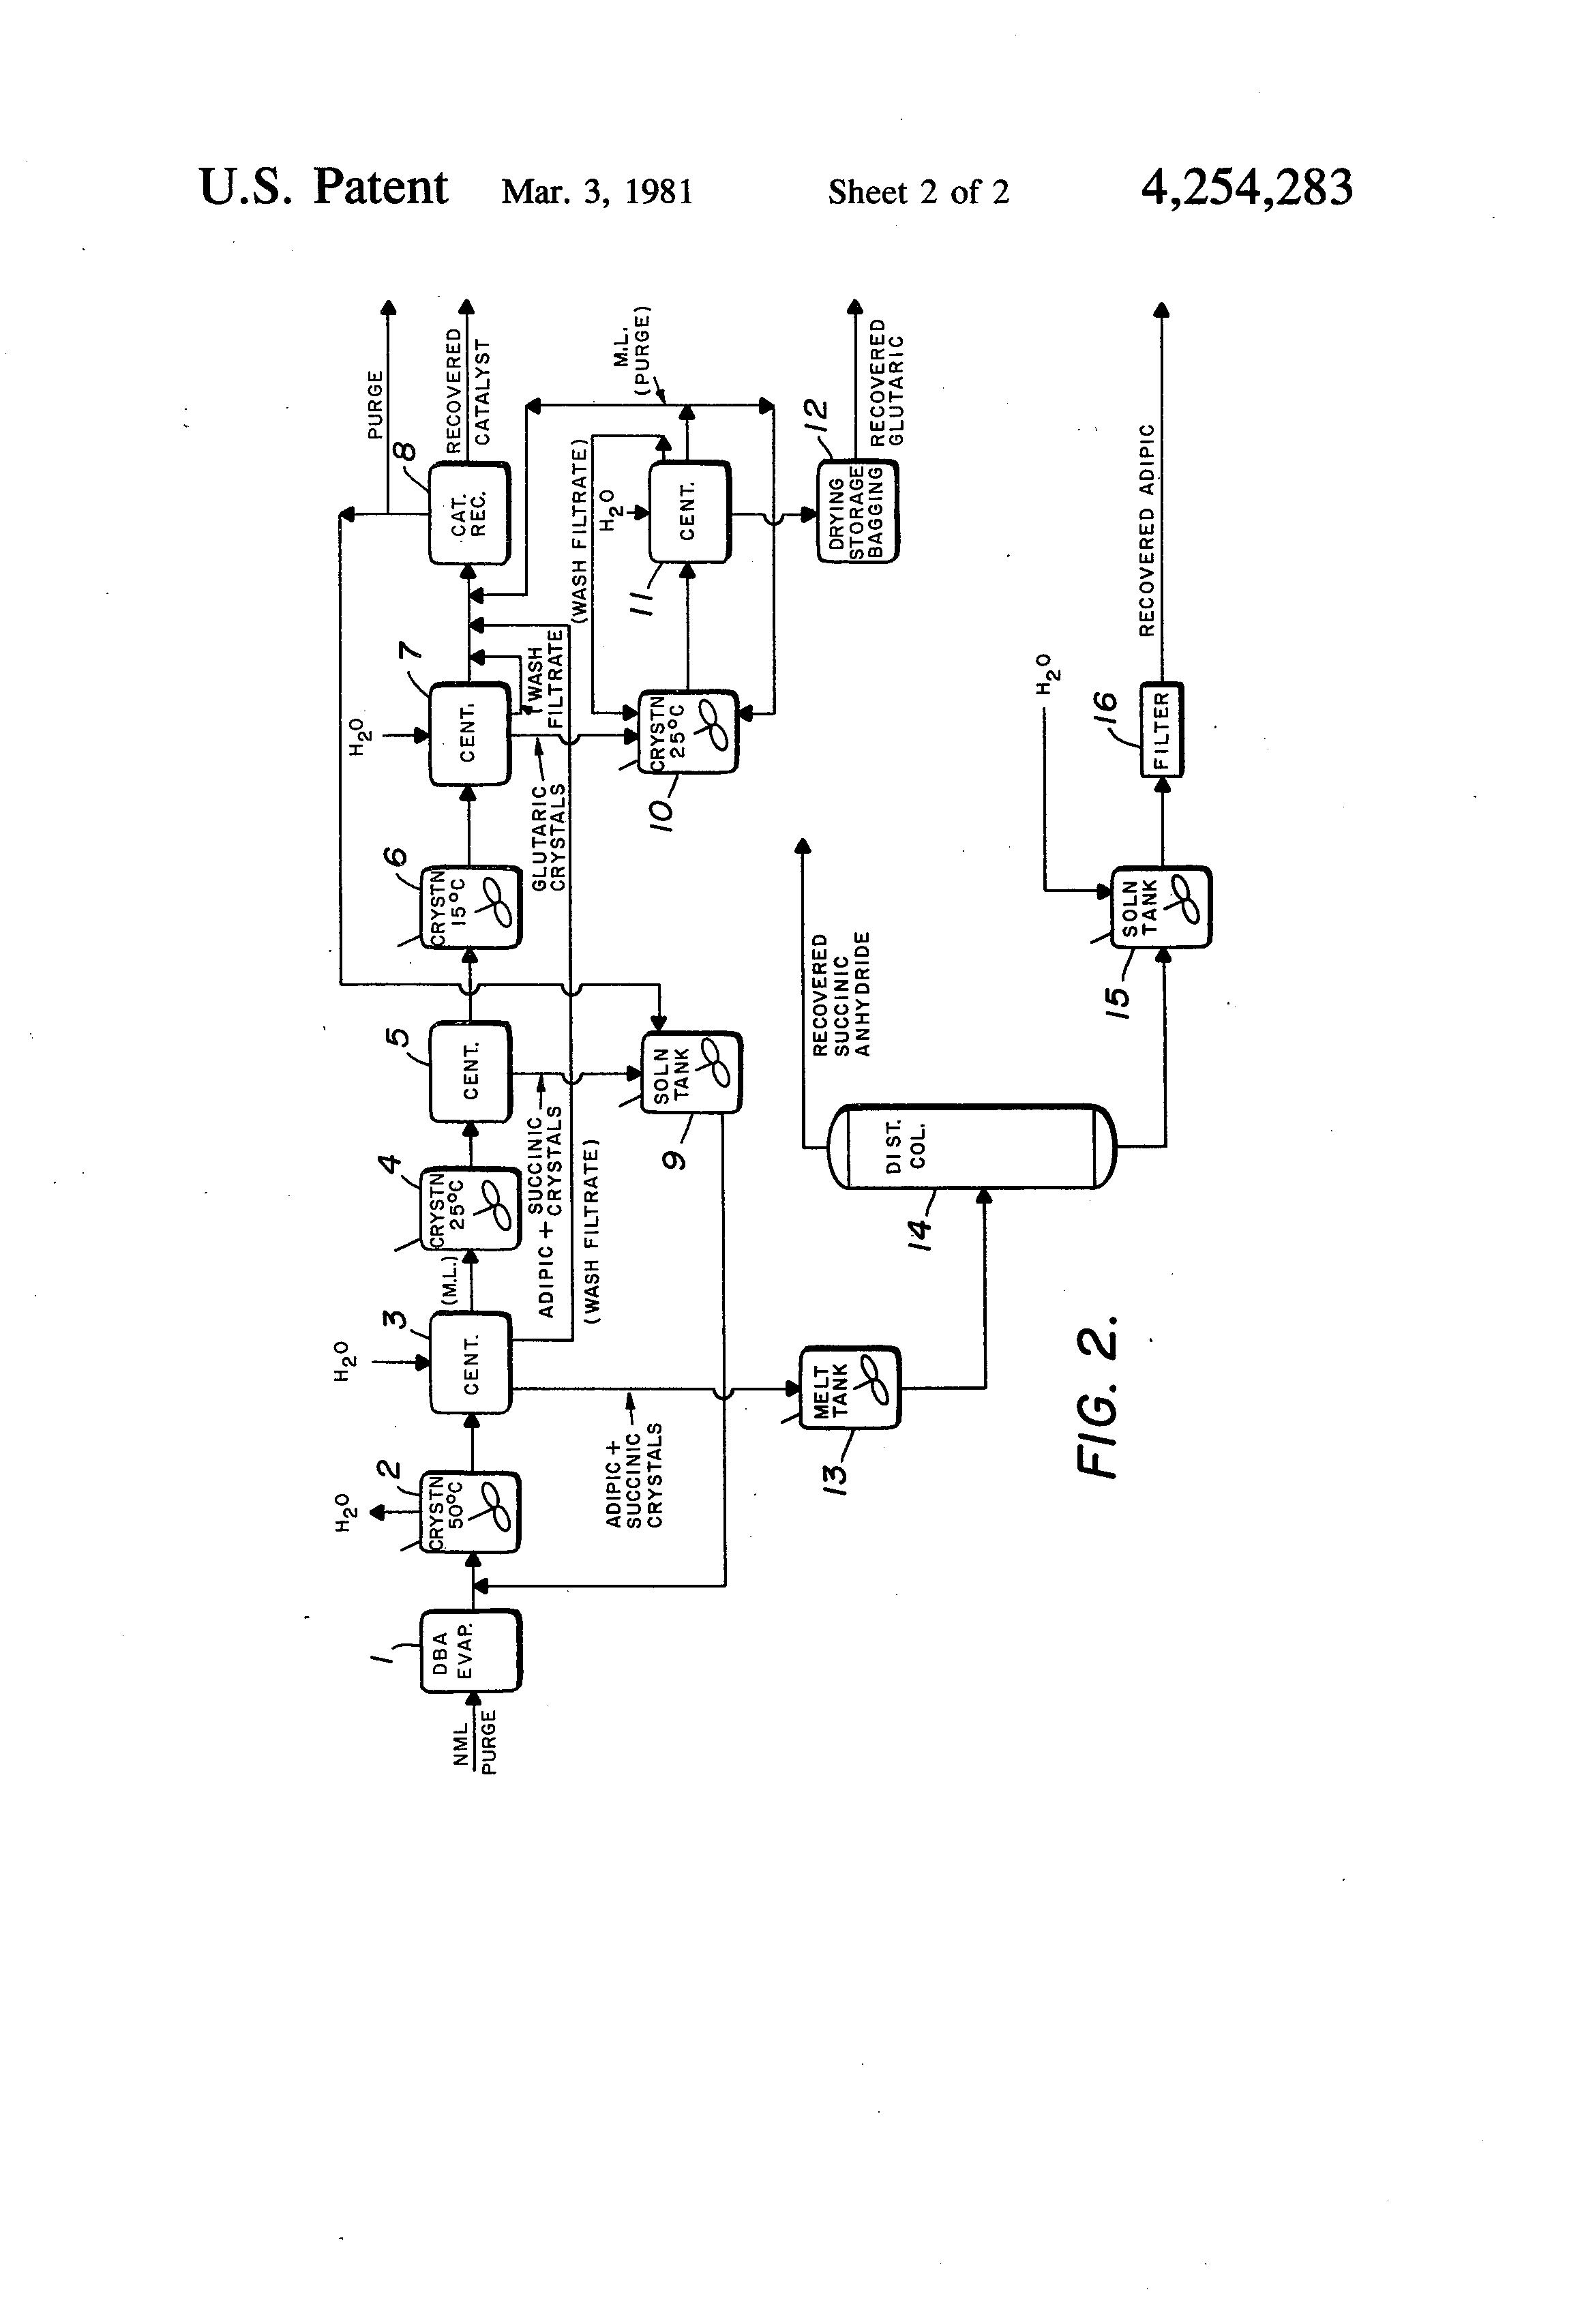 the production of cylohexanon through the oxidation process of cyclohexanol Production process culture media  oxidation of 4-methyl-cyclohexanone) (see also alphand et al 1996,  strate cyclohexanol this process gives a ten fold.